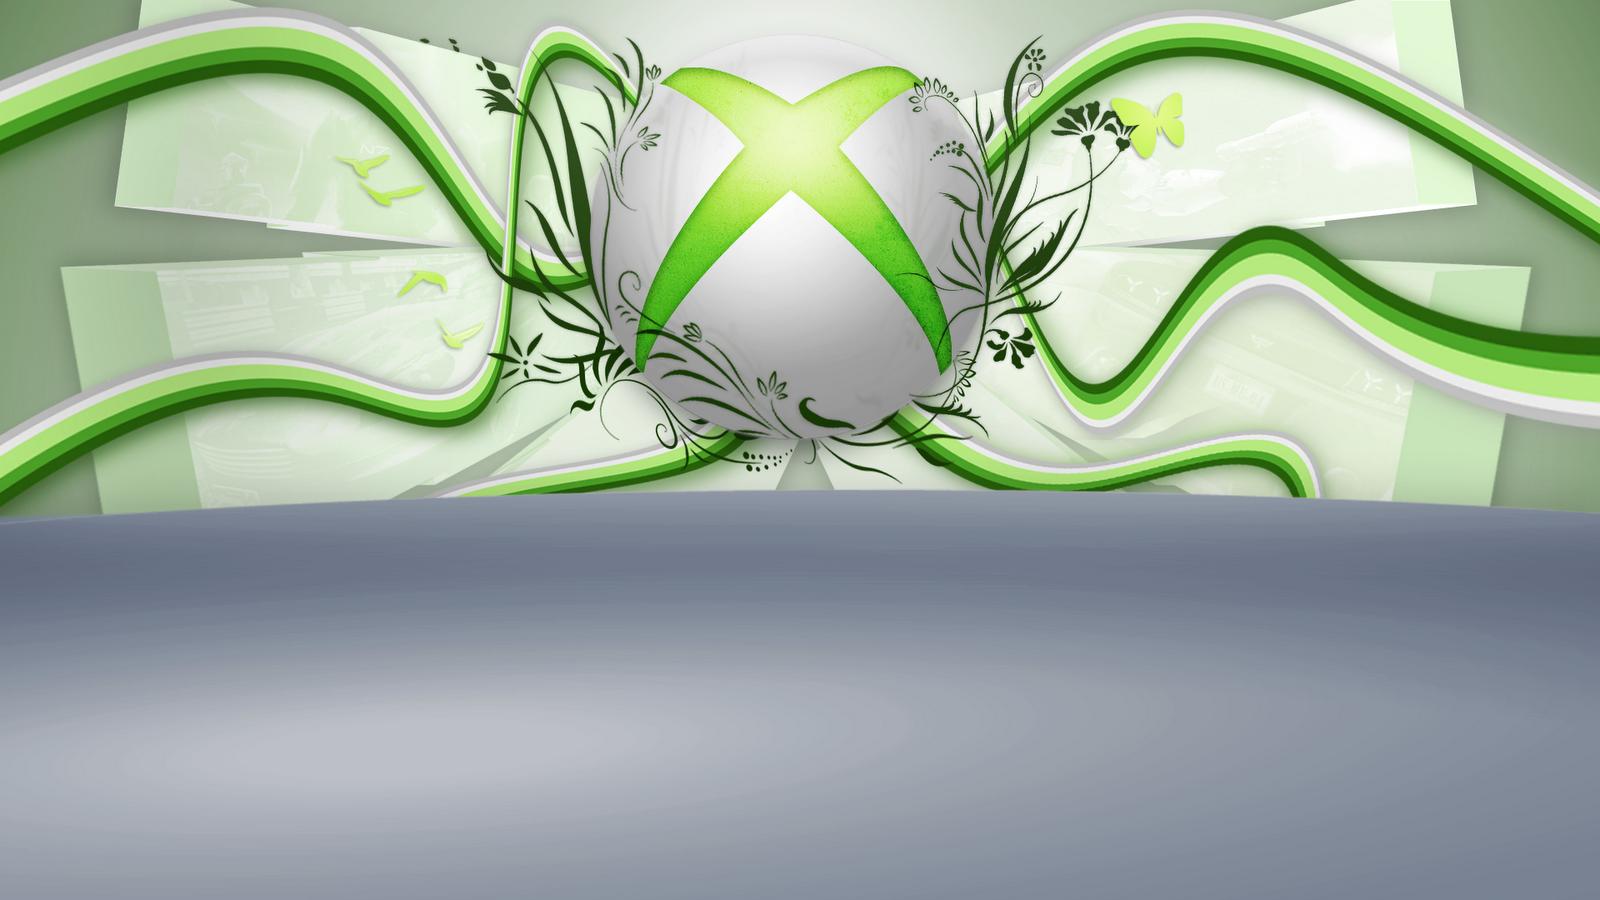 free xbox 360 wallpapers wallpapersafari